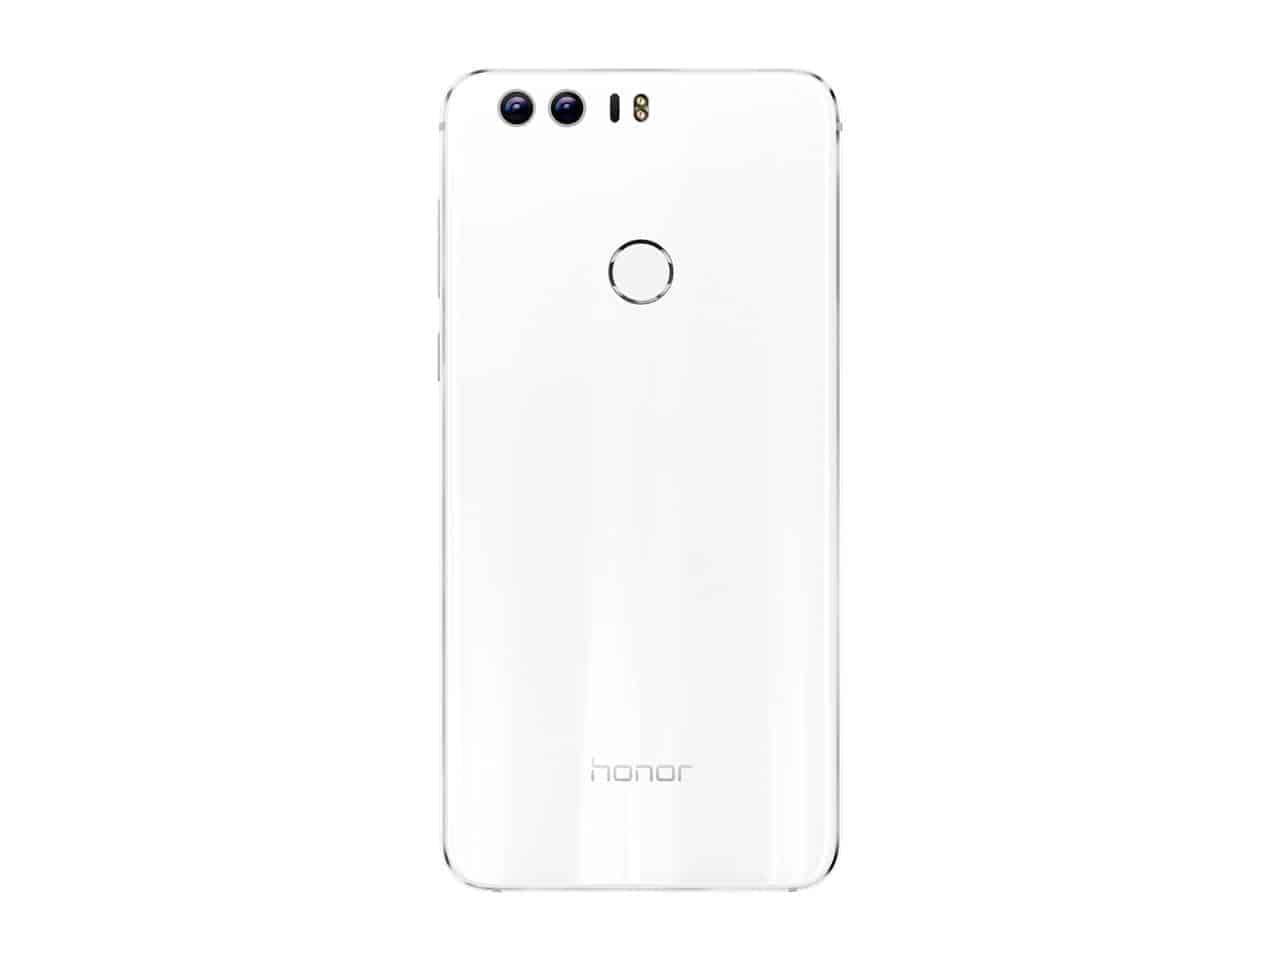 honor 8 5